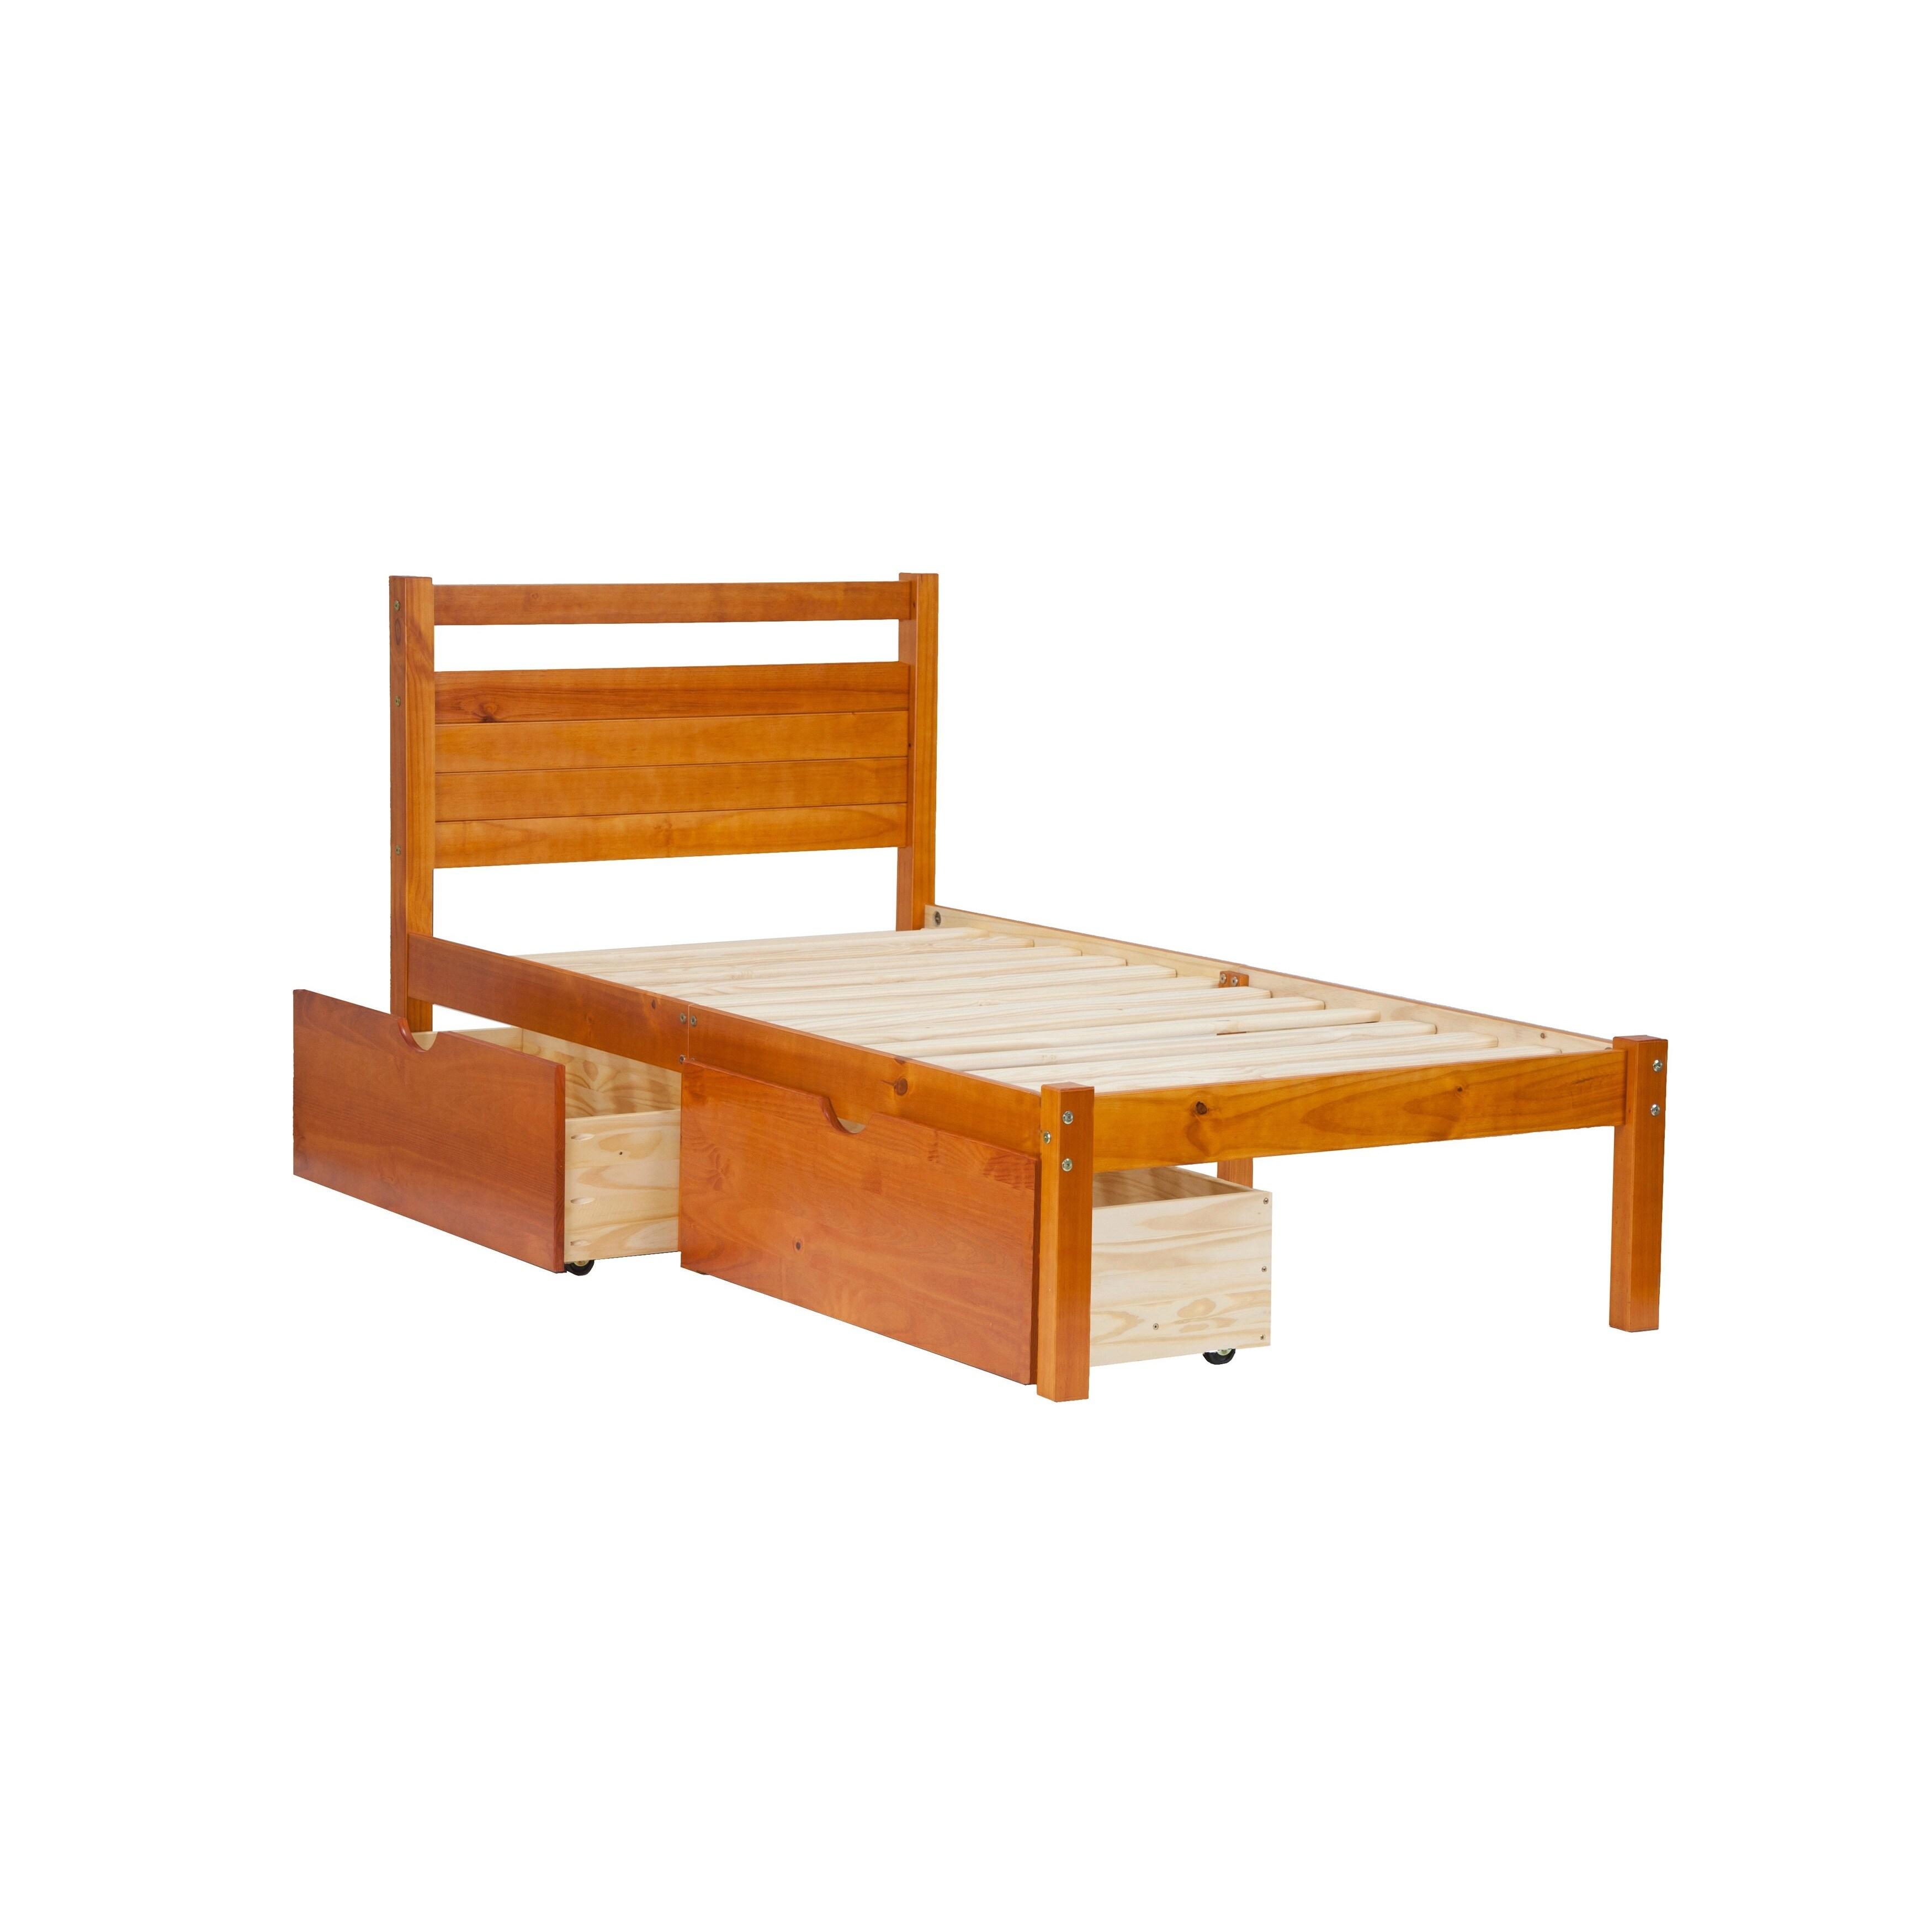 Bronx Pine Wood Twin-size Platform Bed | eBay